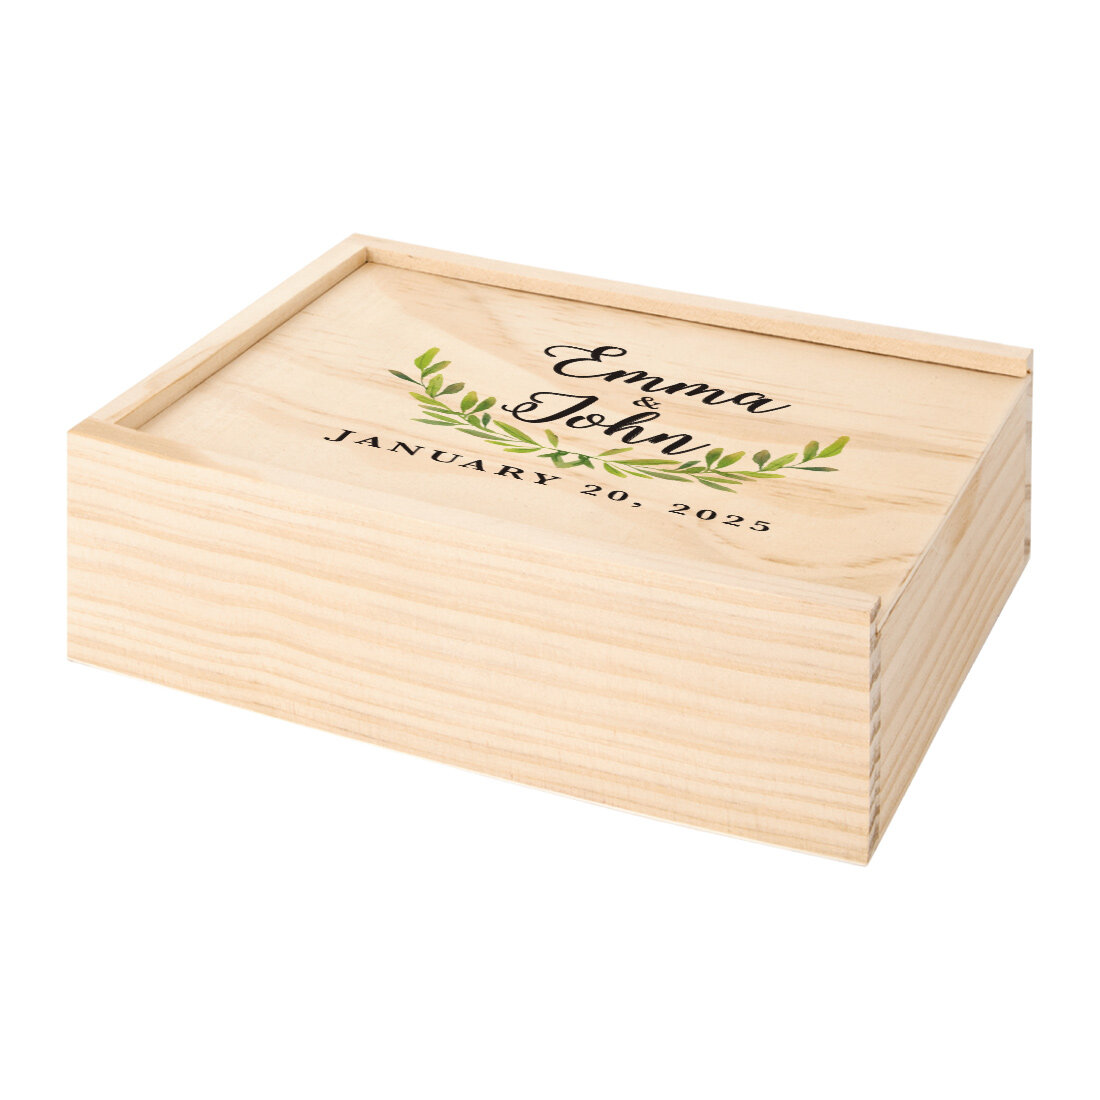 Le Prise Brenton Personalized Memory Box Wayfair